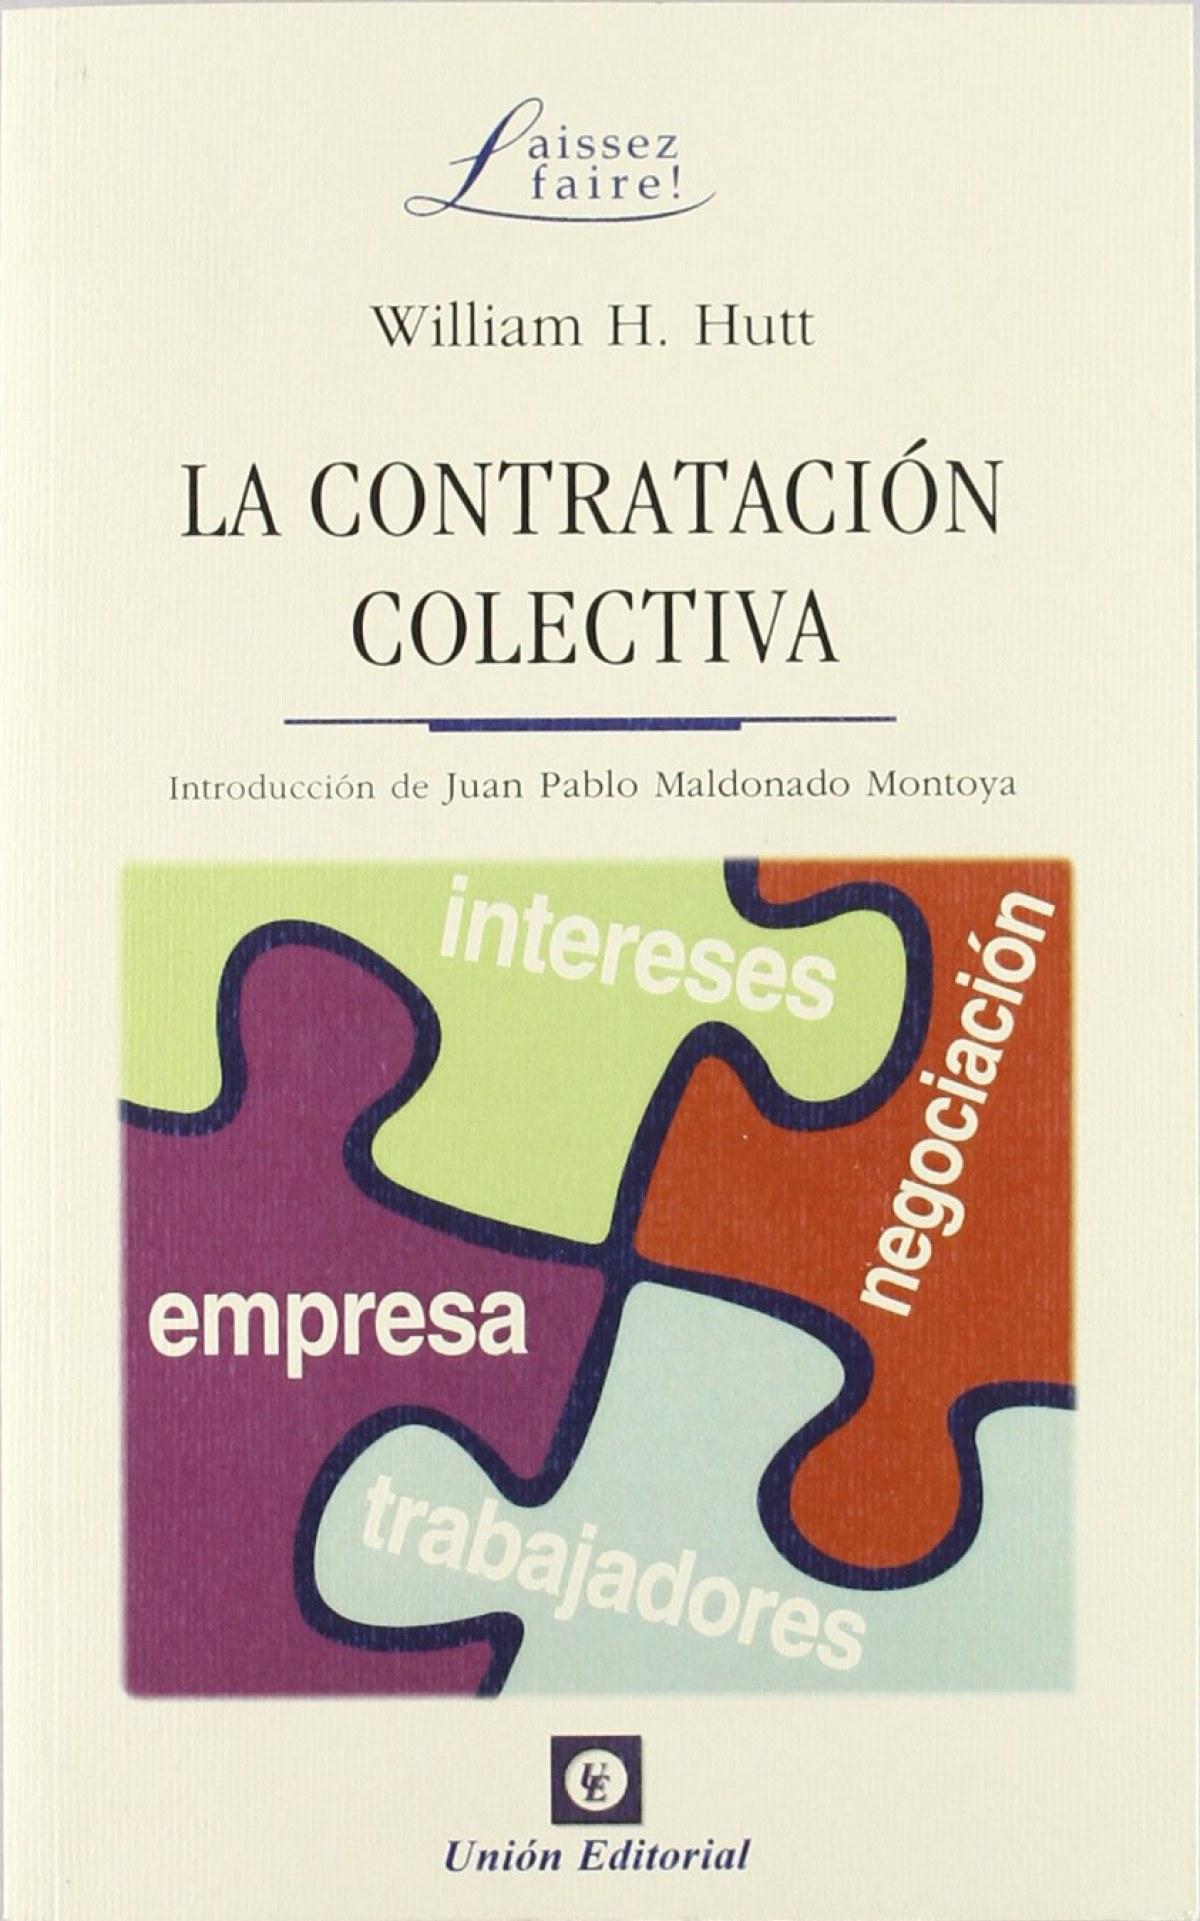 Contratacion Colectiva